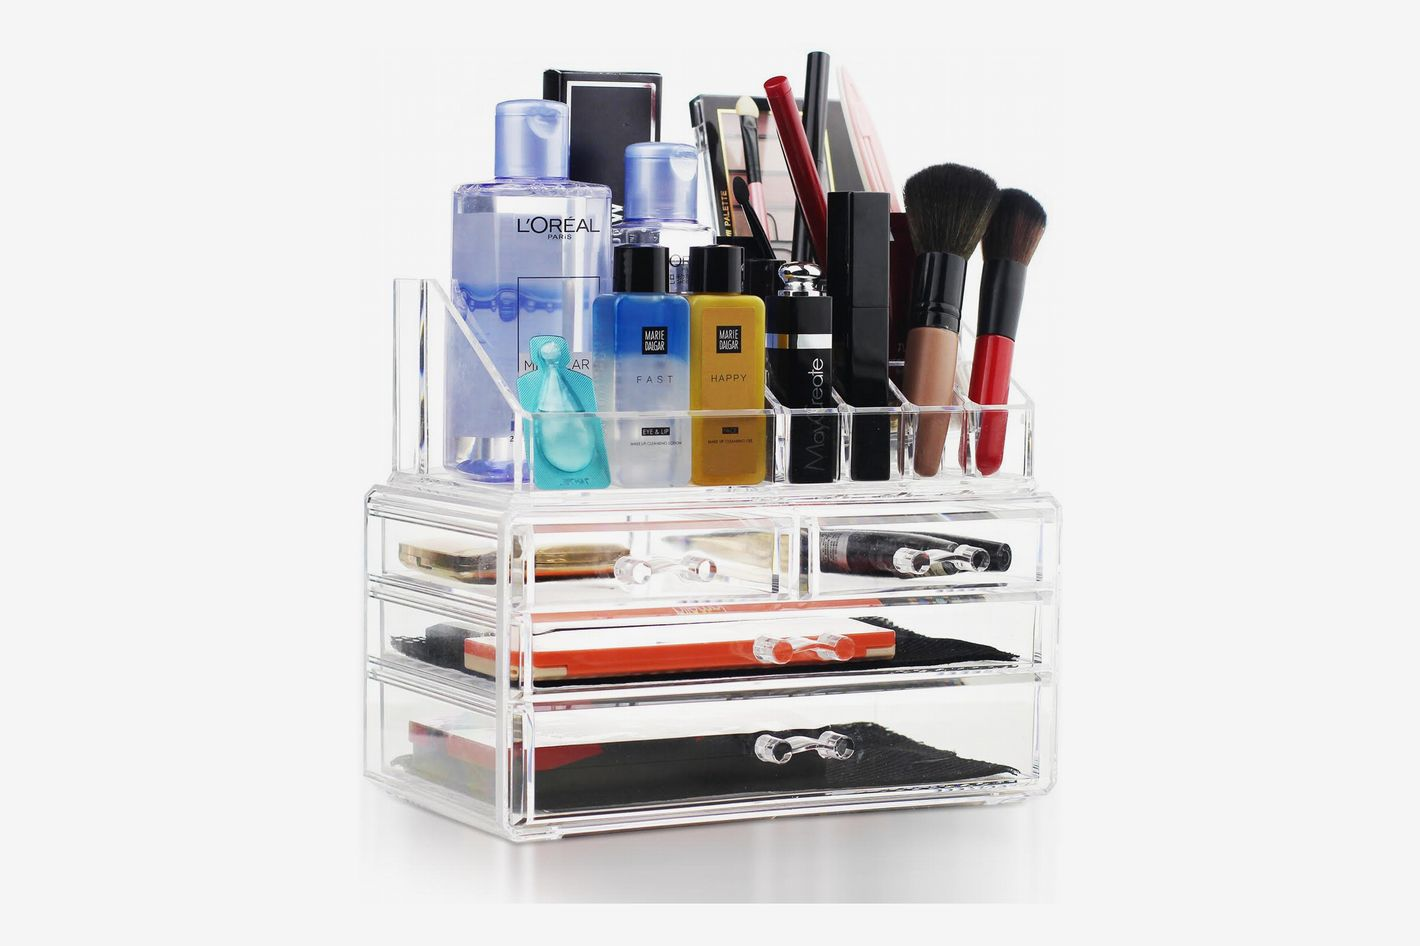 df07ed785002 13 Best Makeup Organizers 2019